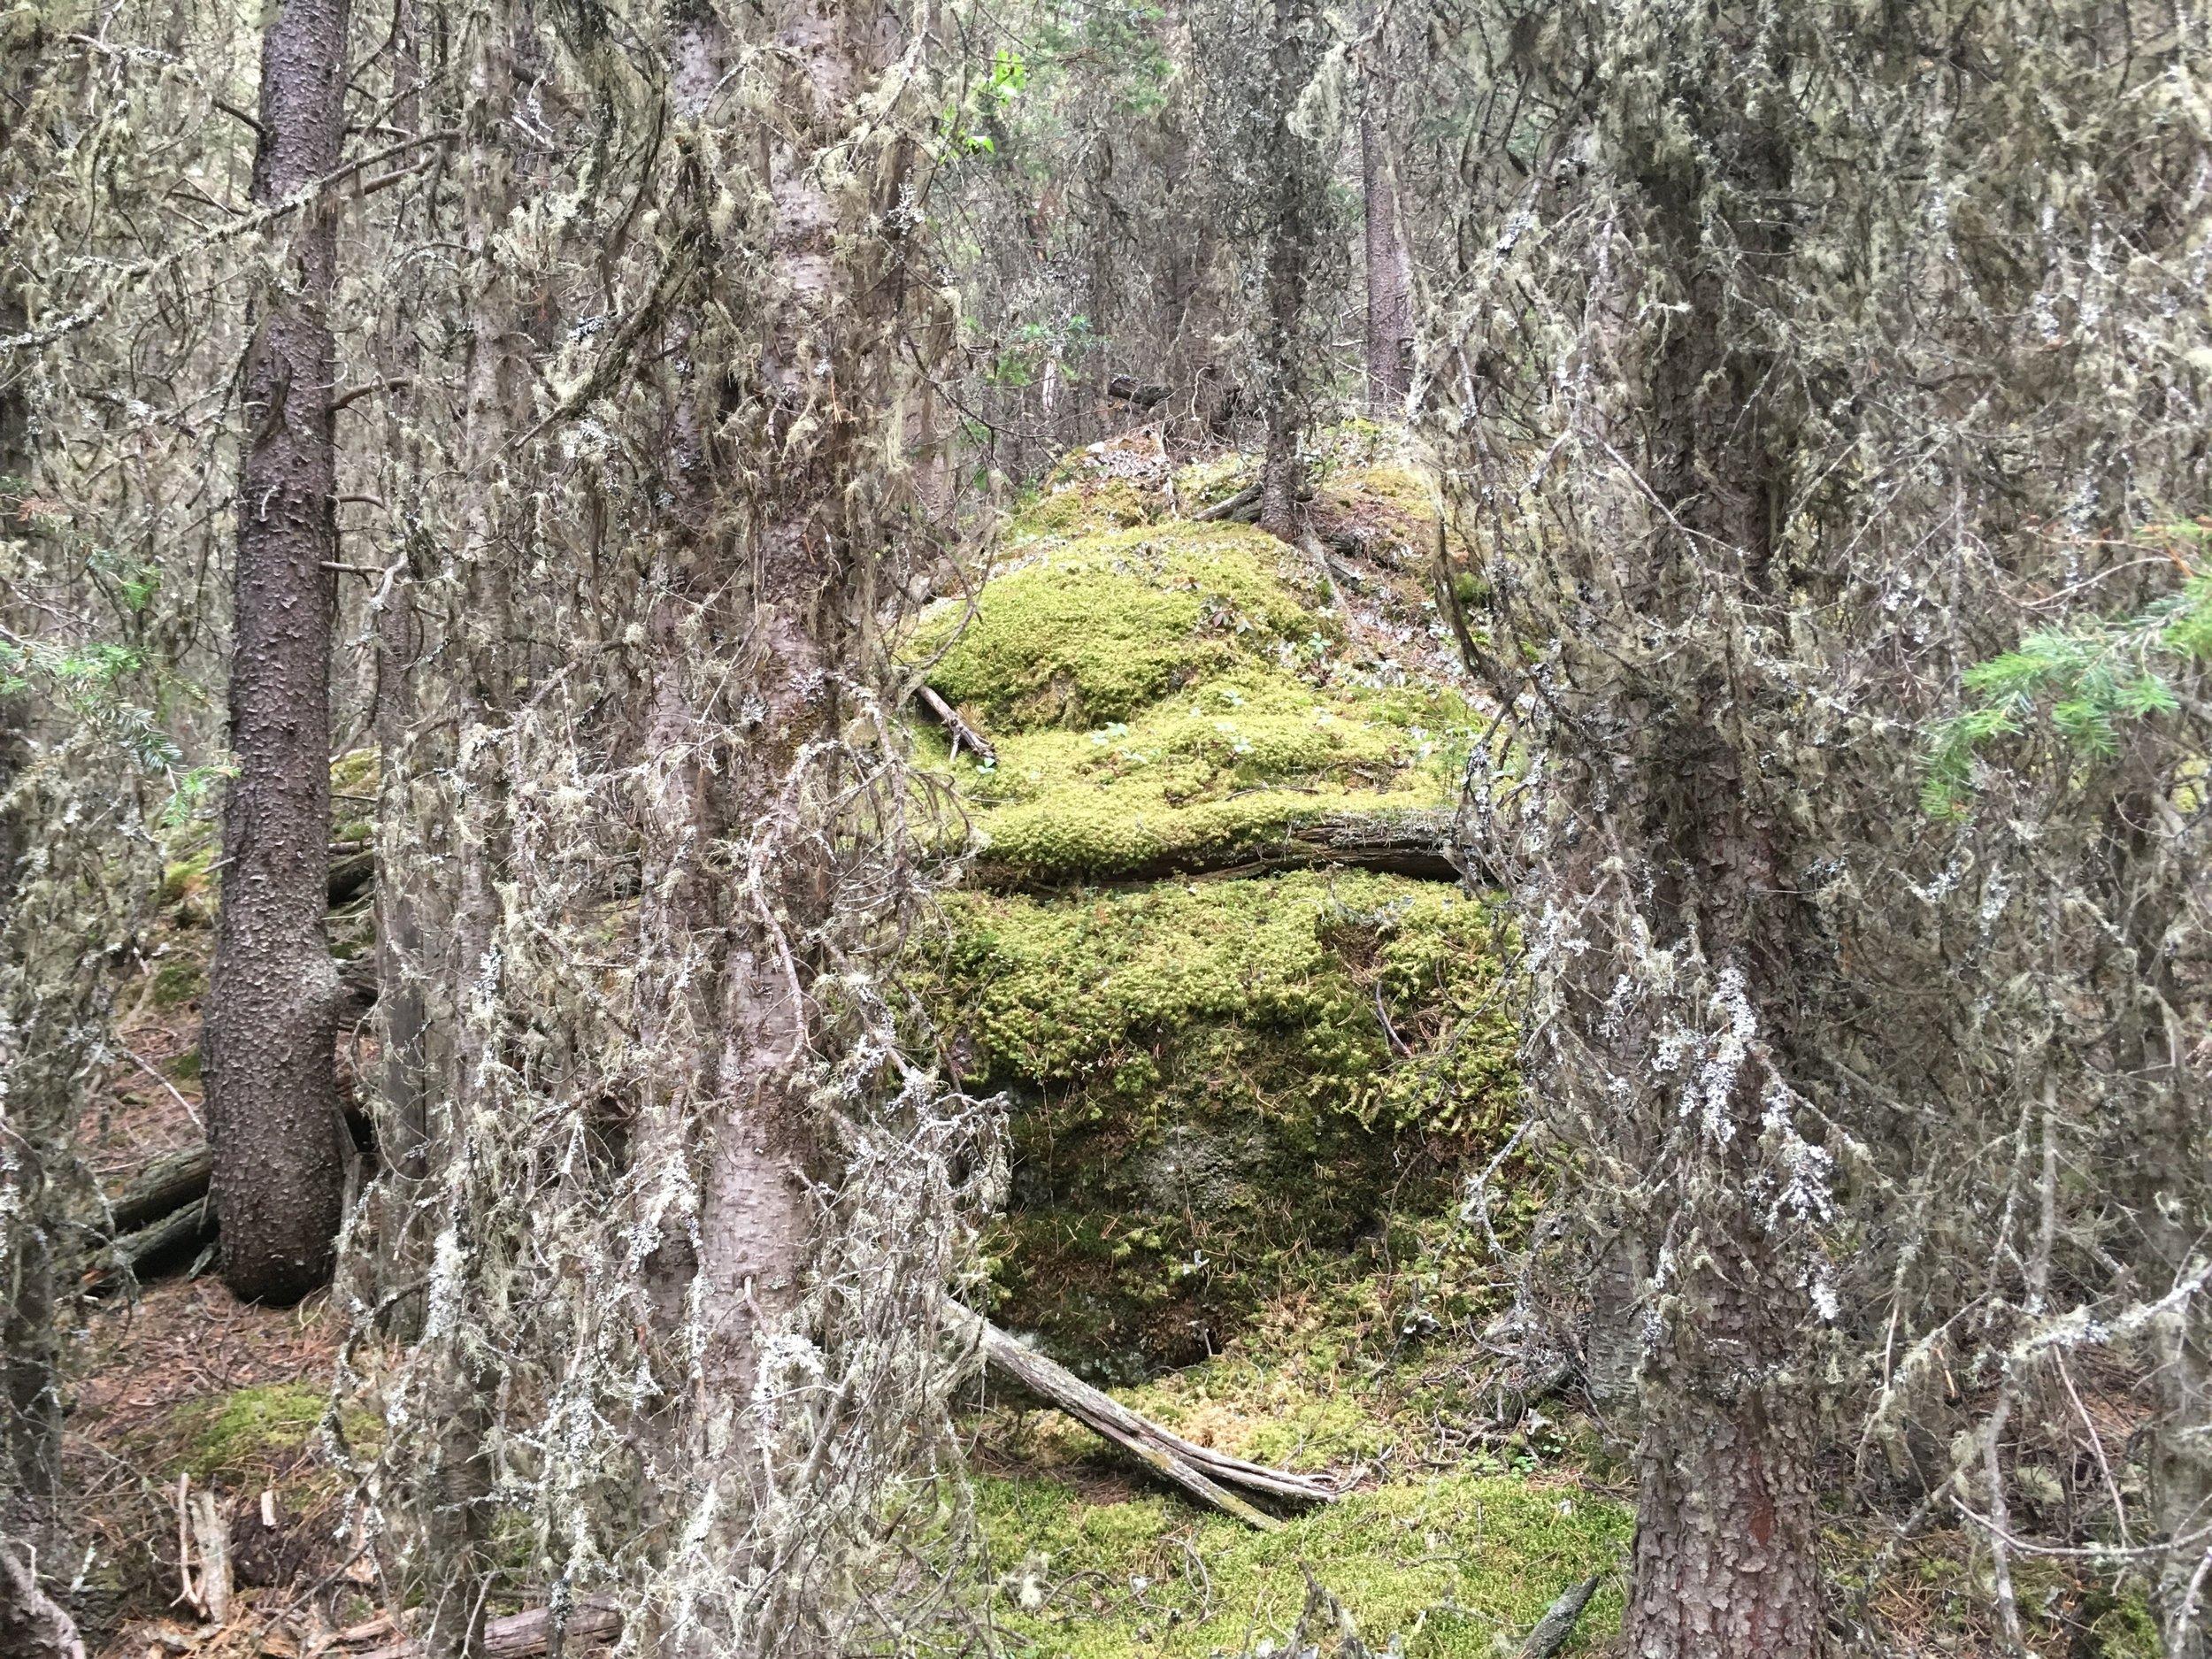 Stoney Squaw Banff